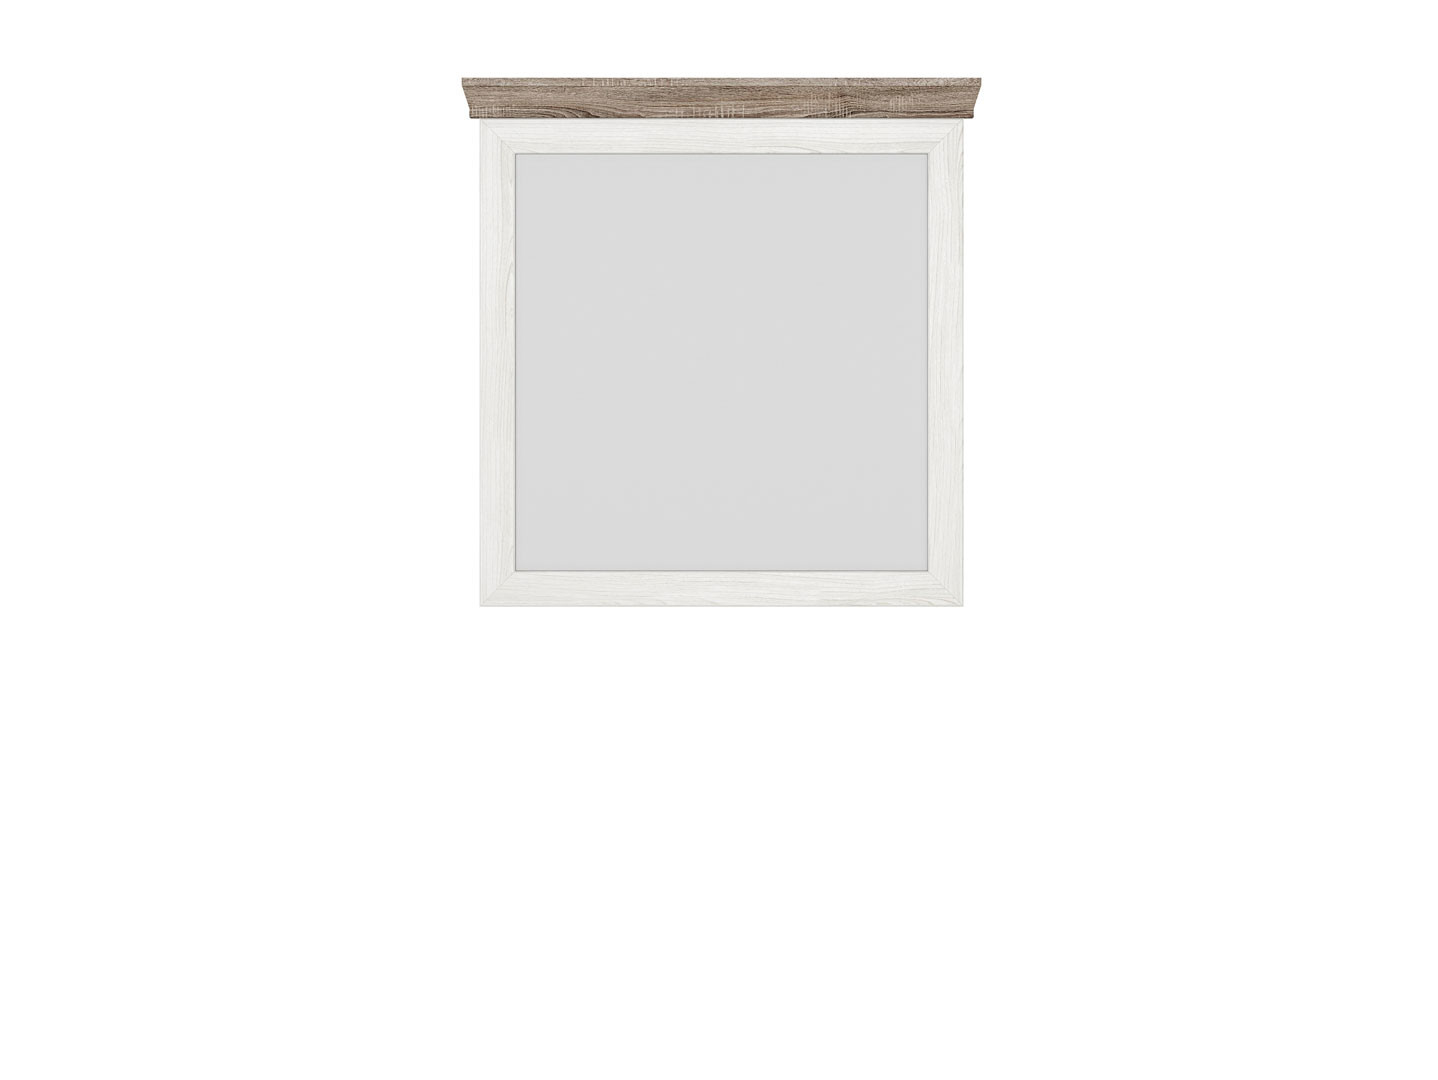 Zrkadlo MARSELLE LUS/98 jaseň snežný/ dub sonoma tmavý